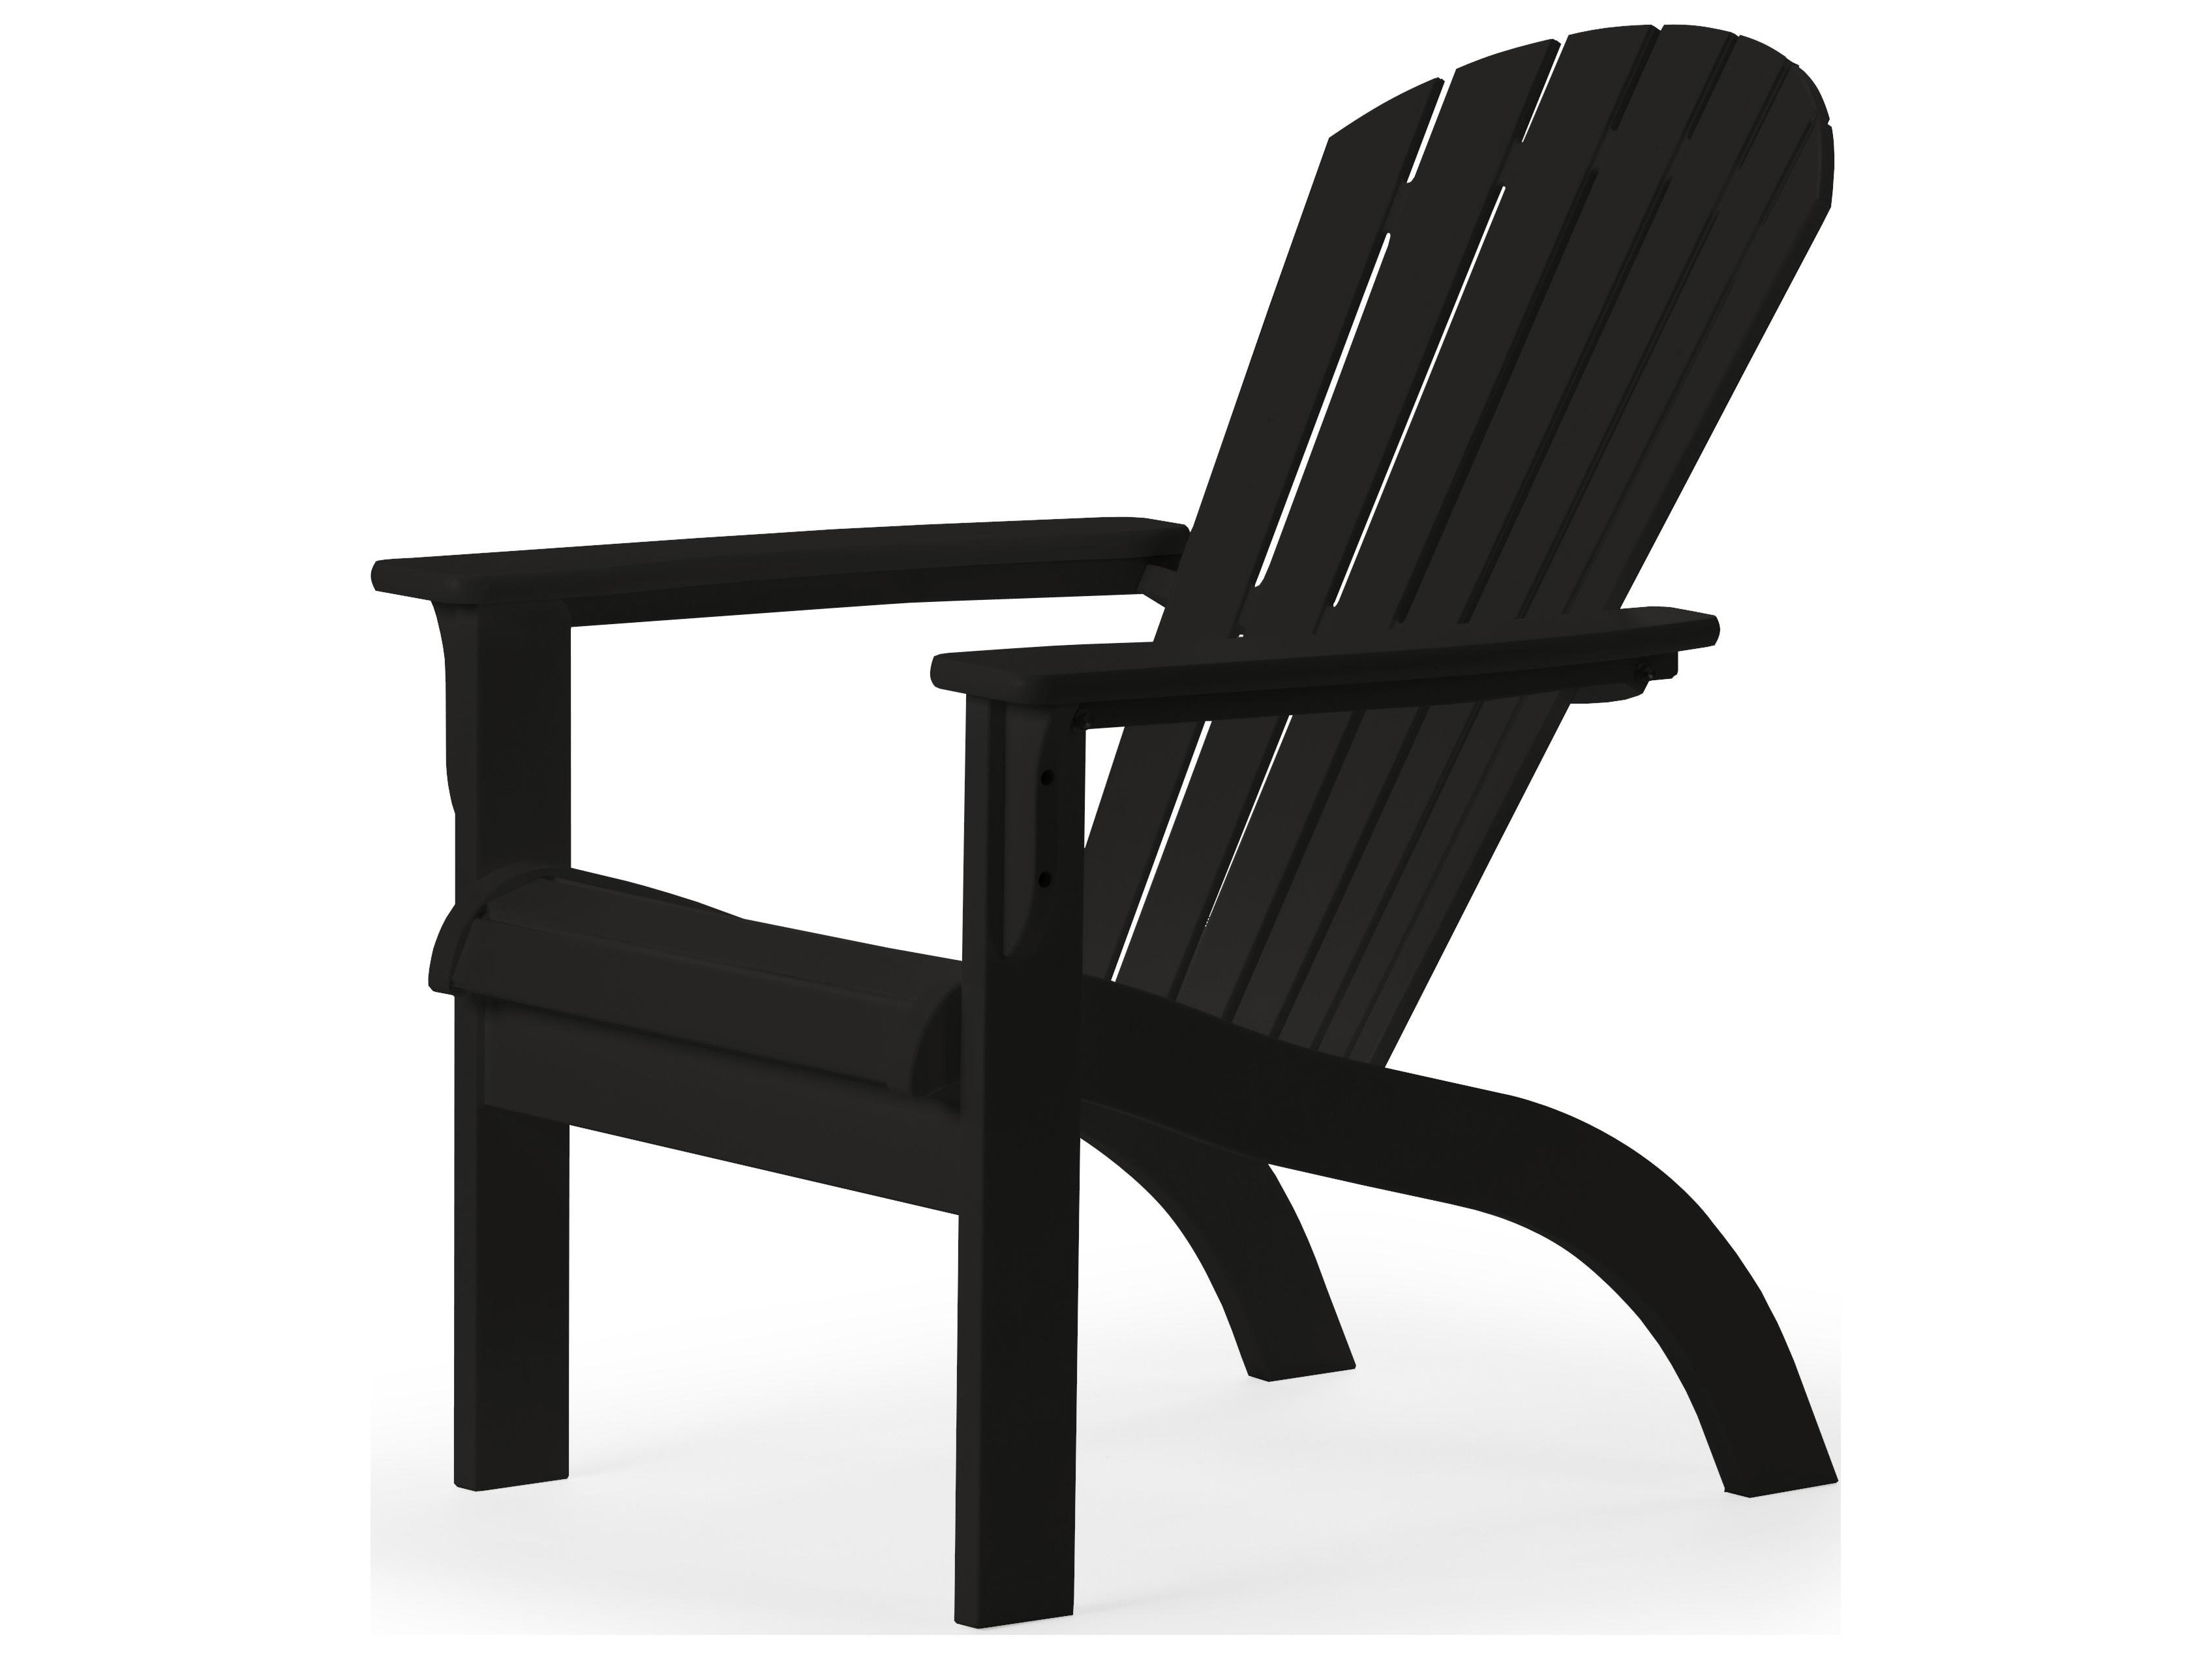 adirondack style plastic chairs uk ikea reclining chair telescope casual mgp recycled lounge